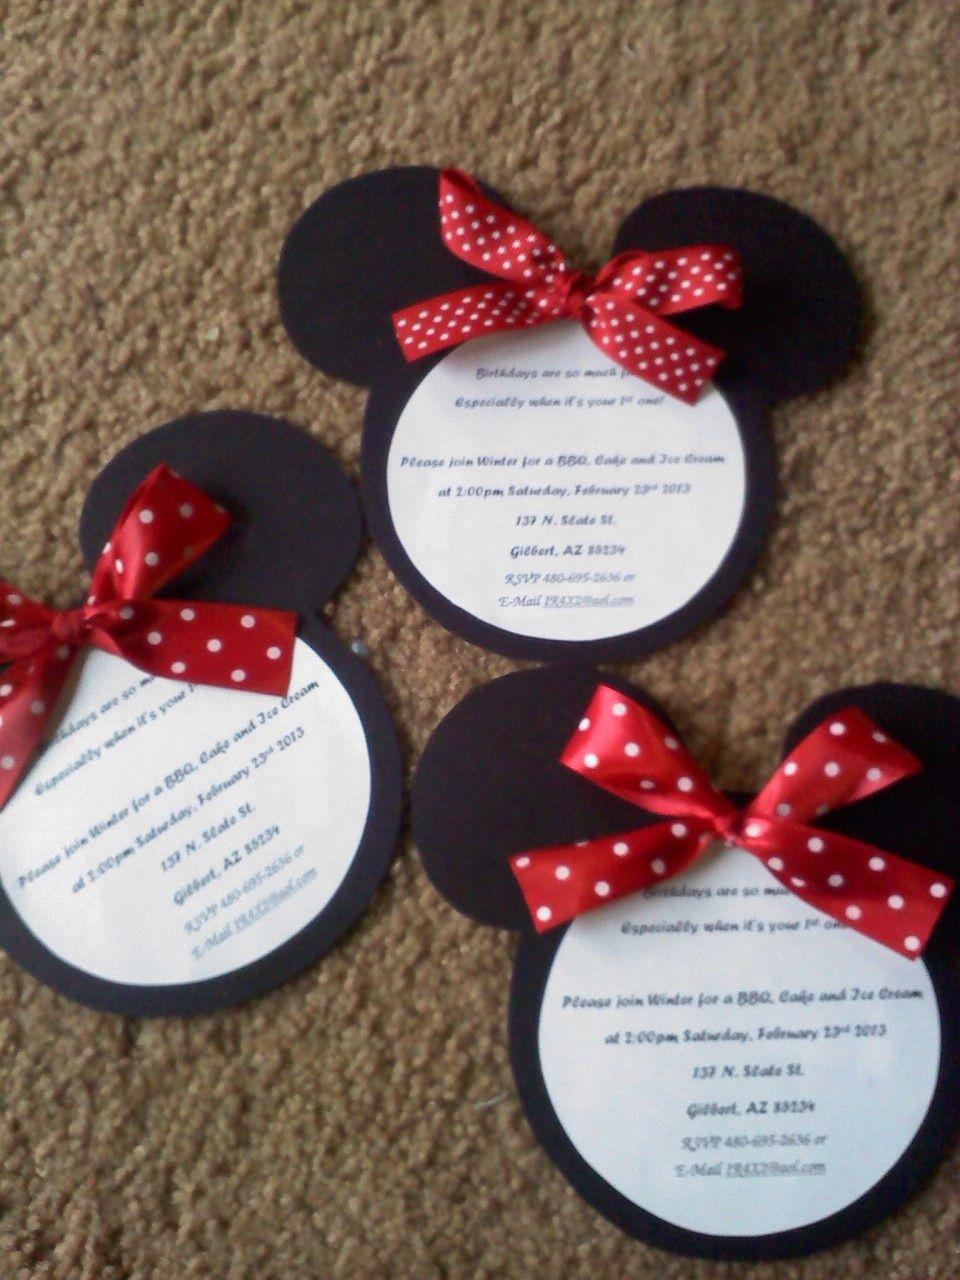 Minnie mouse party invitations mimi mouse pinterest minnie ideas minnie mouse party invitations solutioingenieria Choice Image